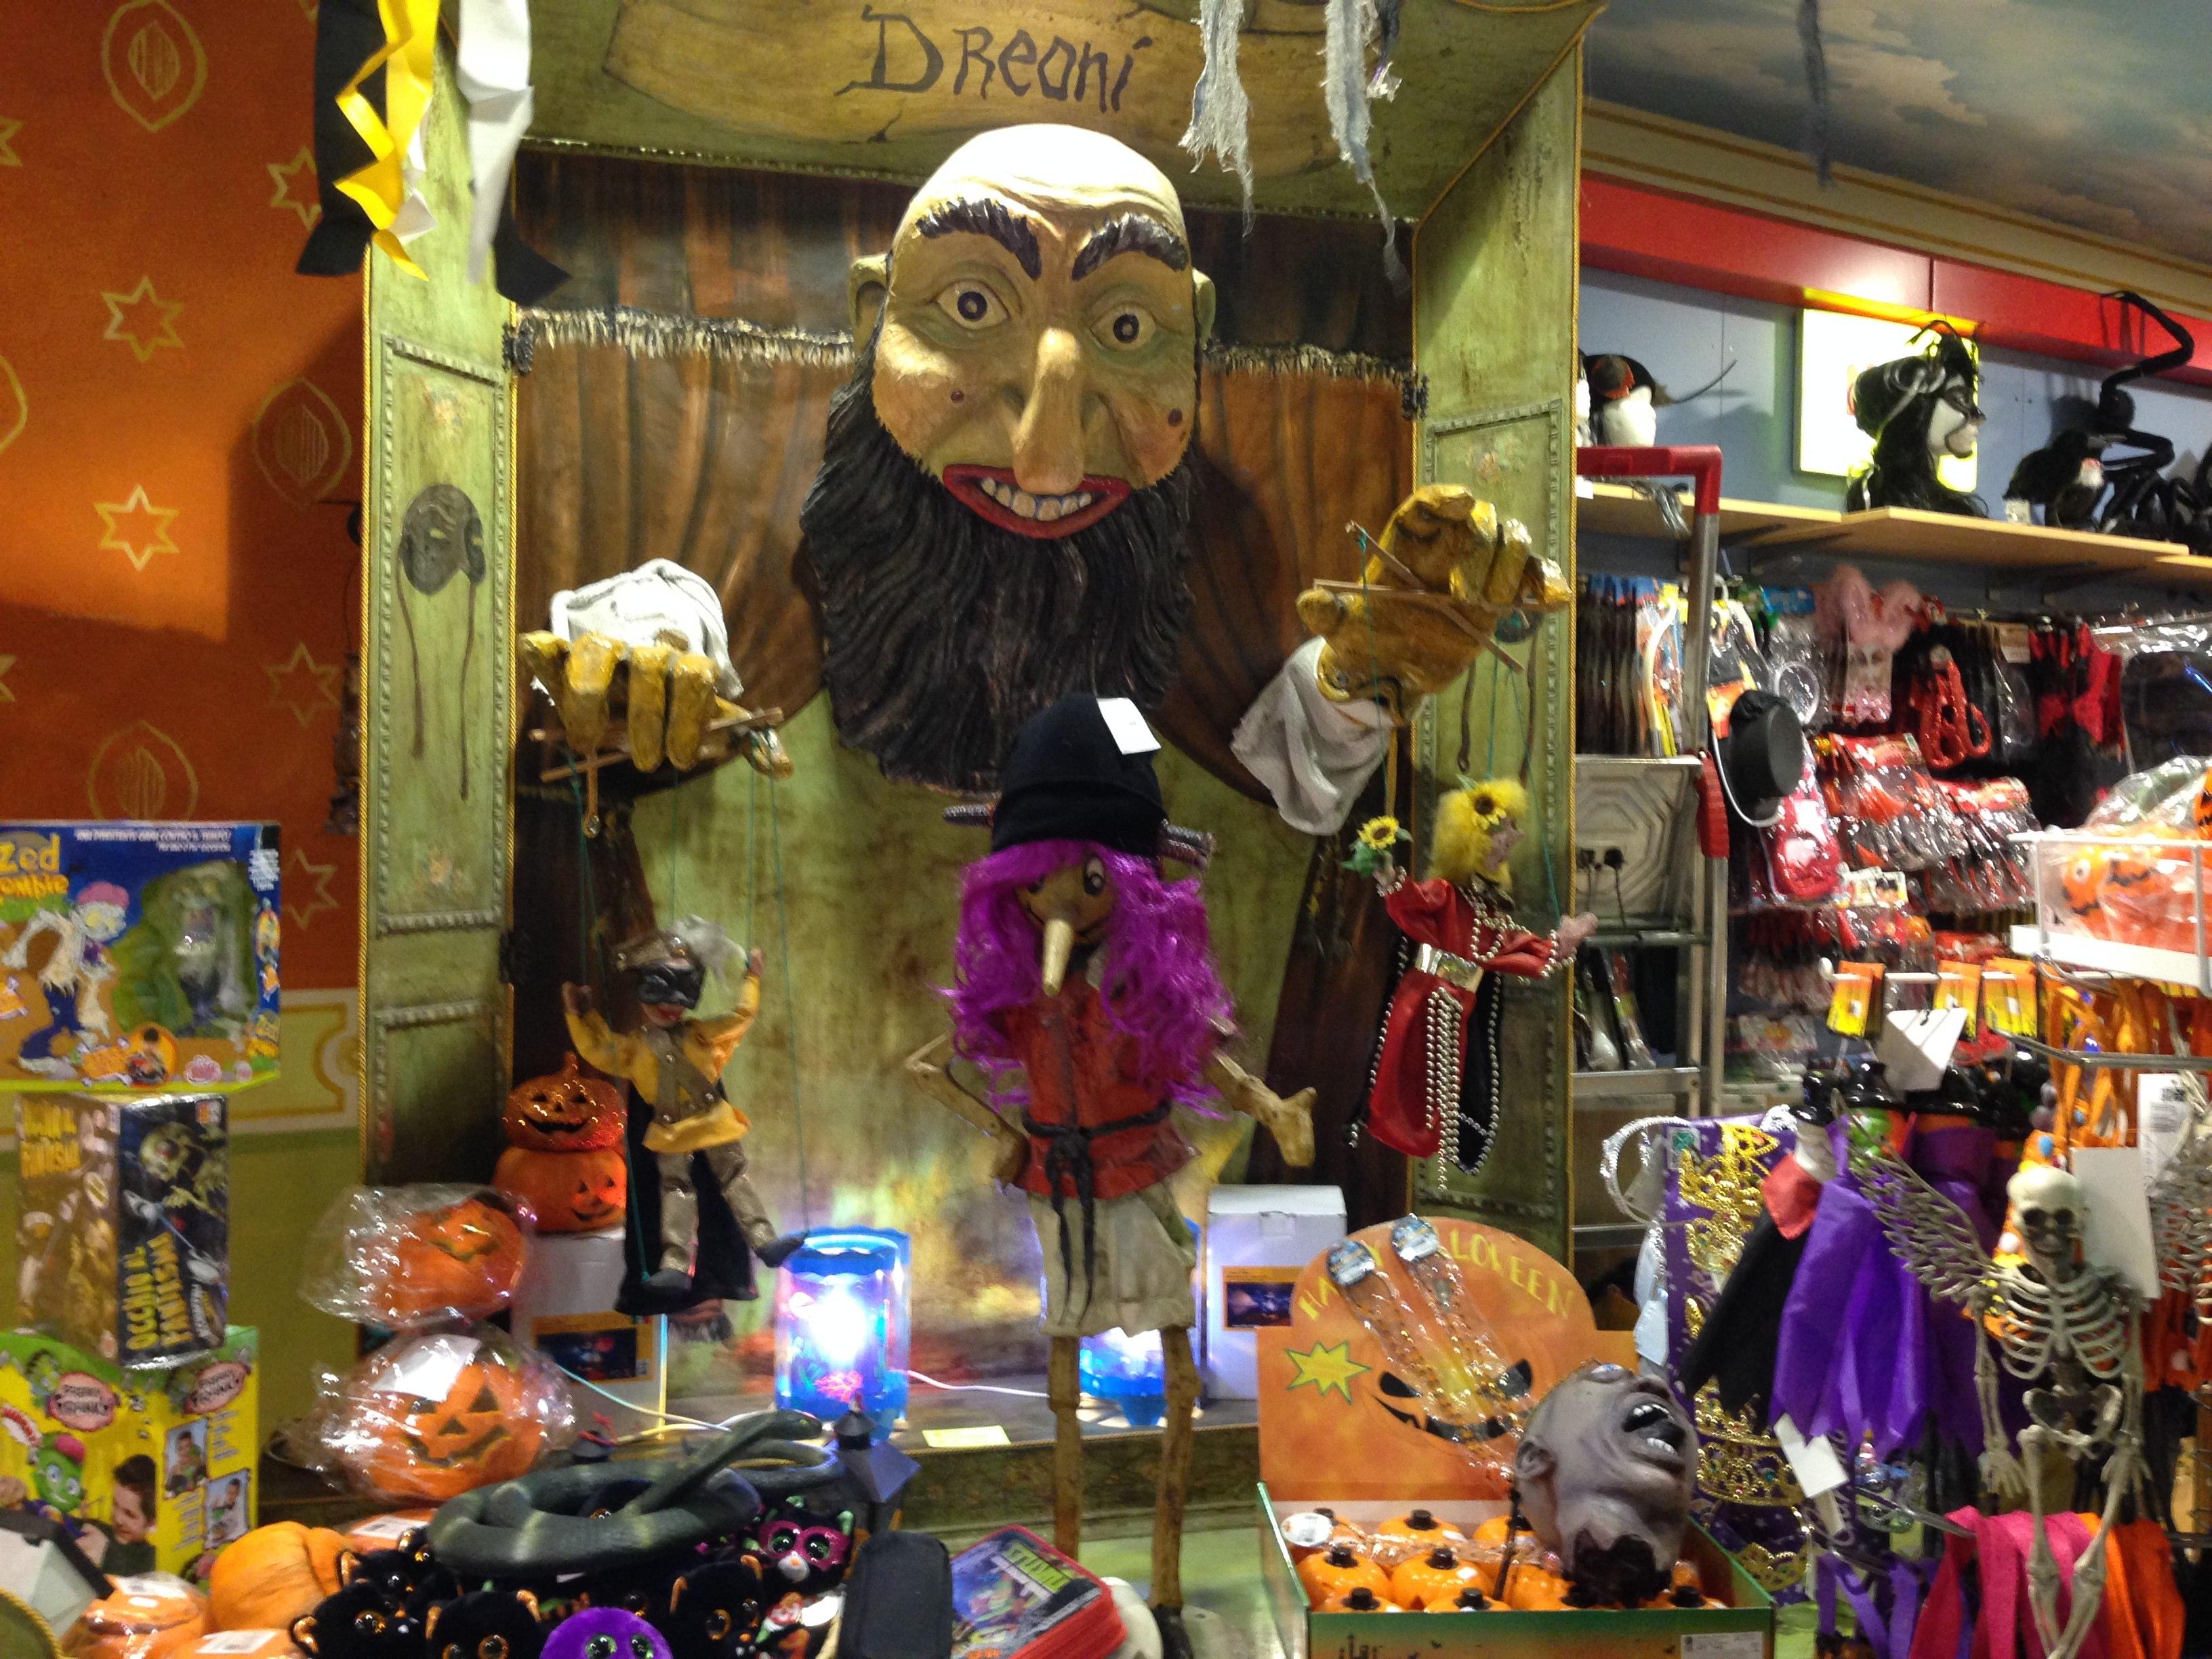 Negozi per halloween Firenze … fate un salto da Dreoni